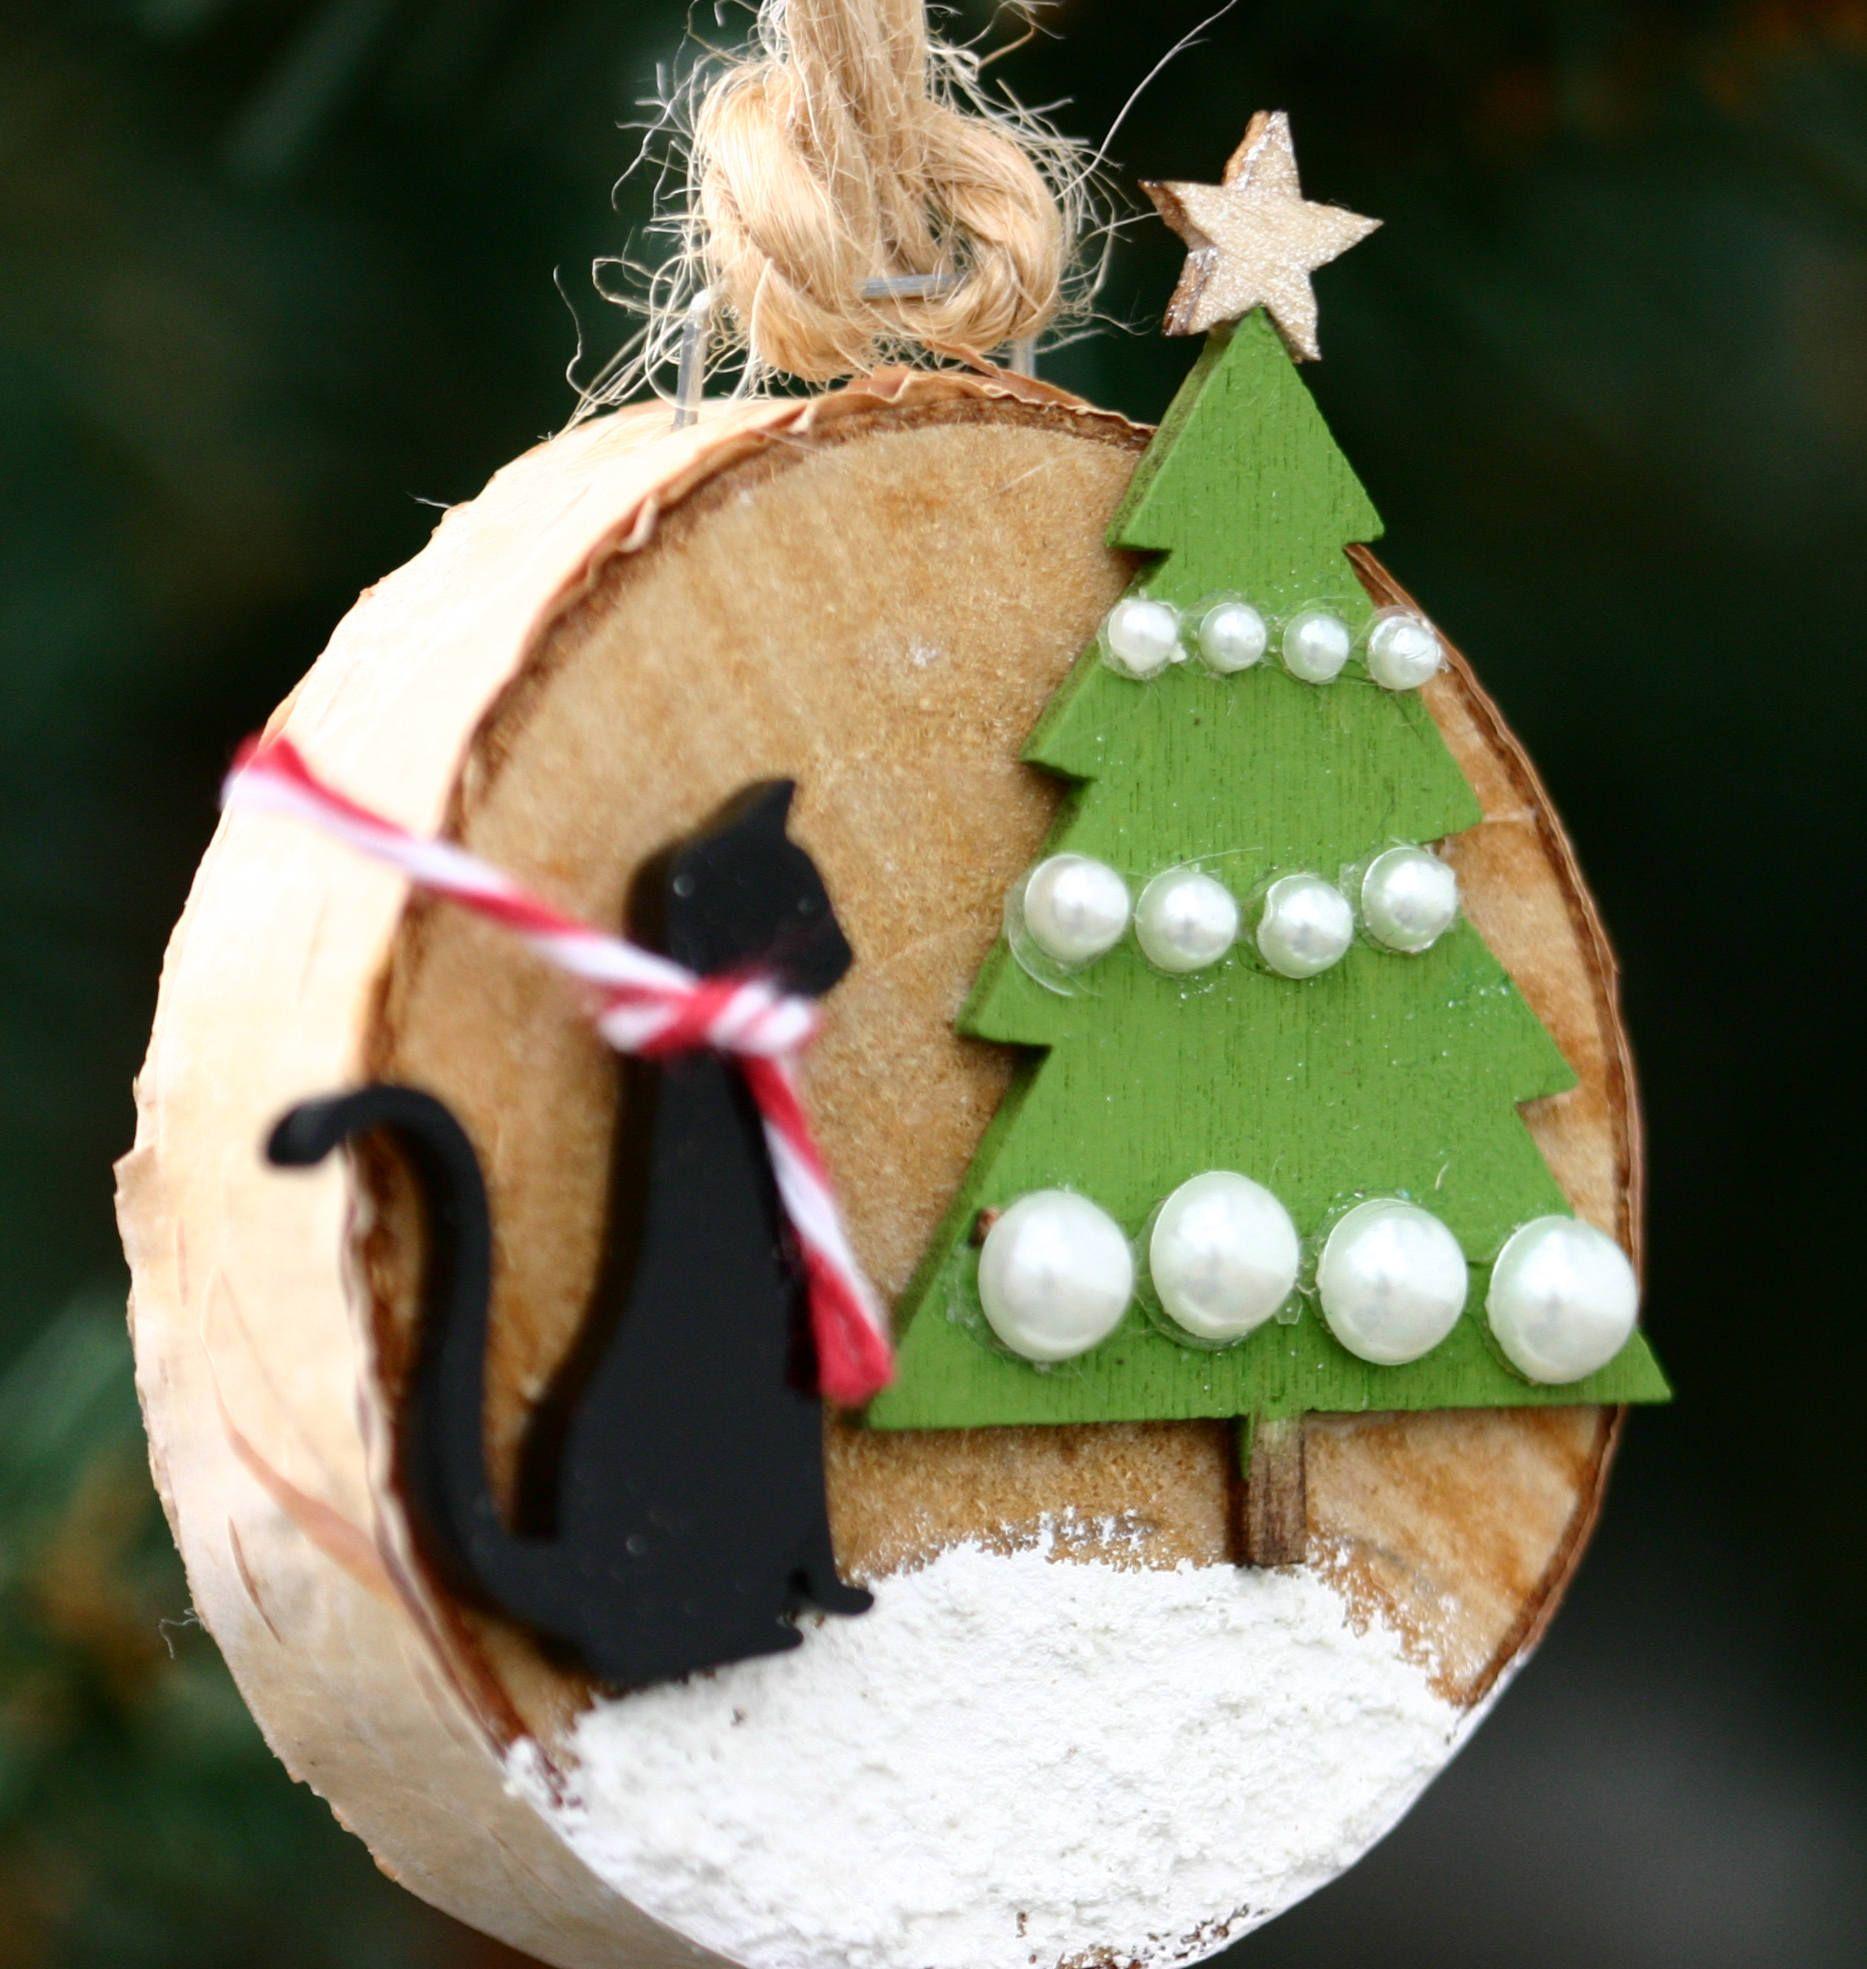 Christmas Tree Made Of Black Cats: Cat Christmas Tree Ornament, Wood Slice Ornament, Birch